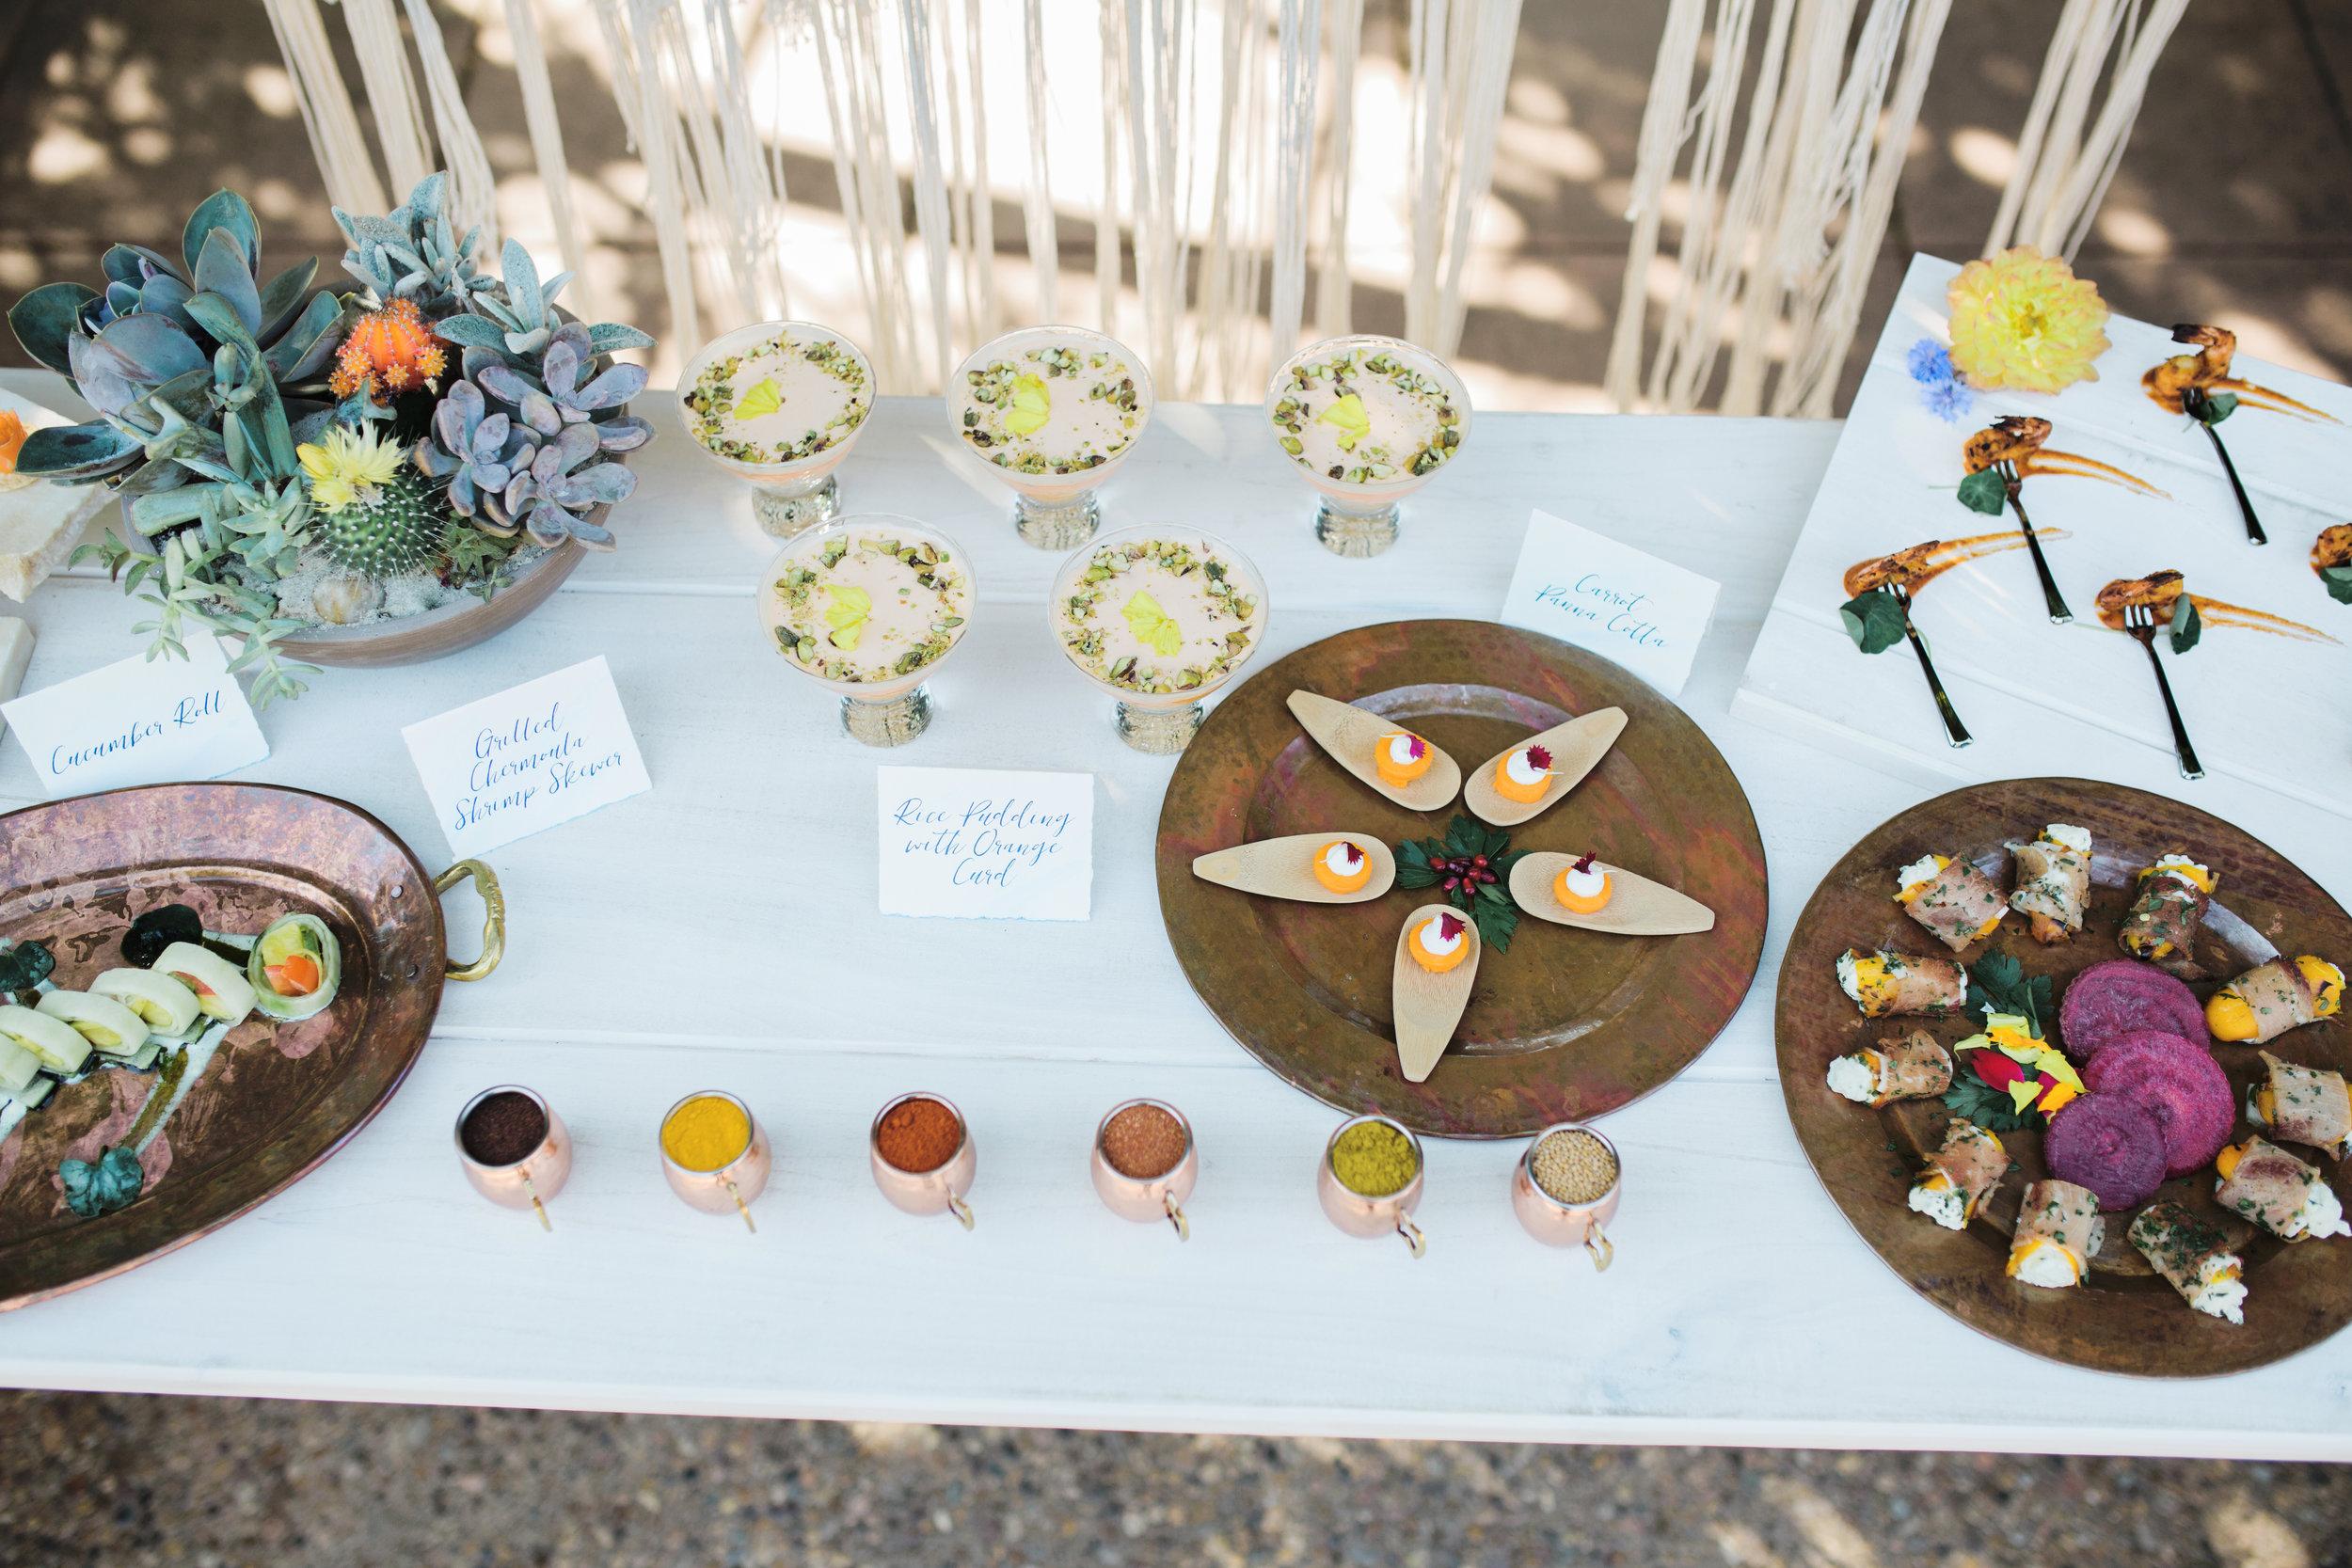 Bohemian-Desert Inspired Bridal Brunch Bites | Rocky Mountain Bride Magazine | Boho Wedding Inspiration | Michelle Leo Events | Utah Event Planner and Designer | Alixann Loosle Photography